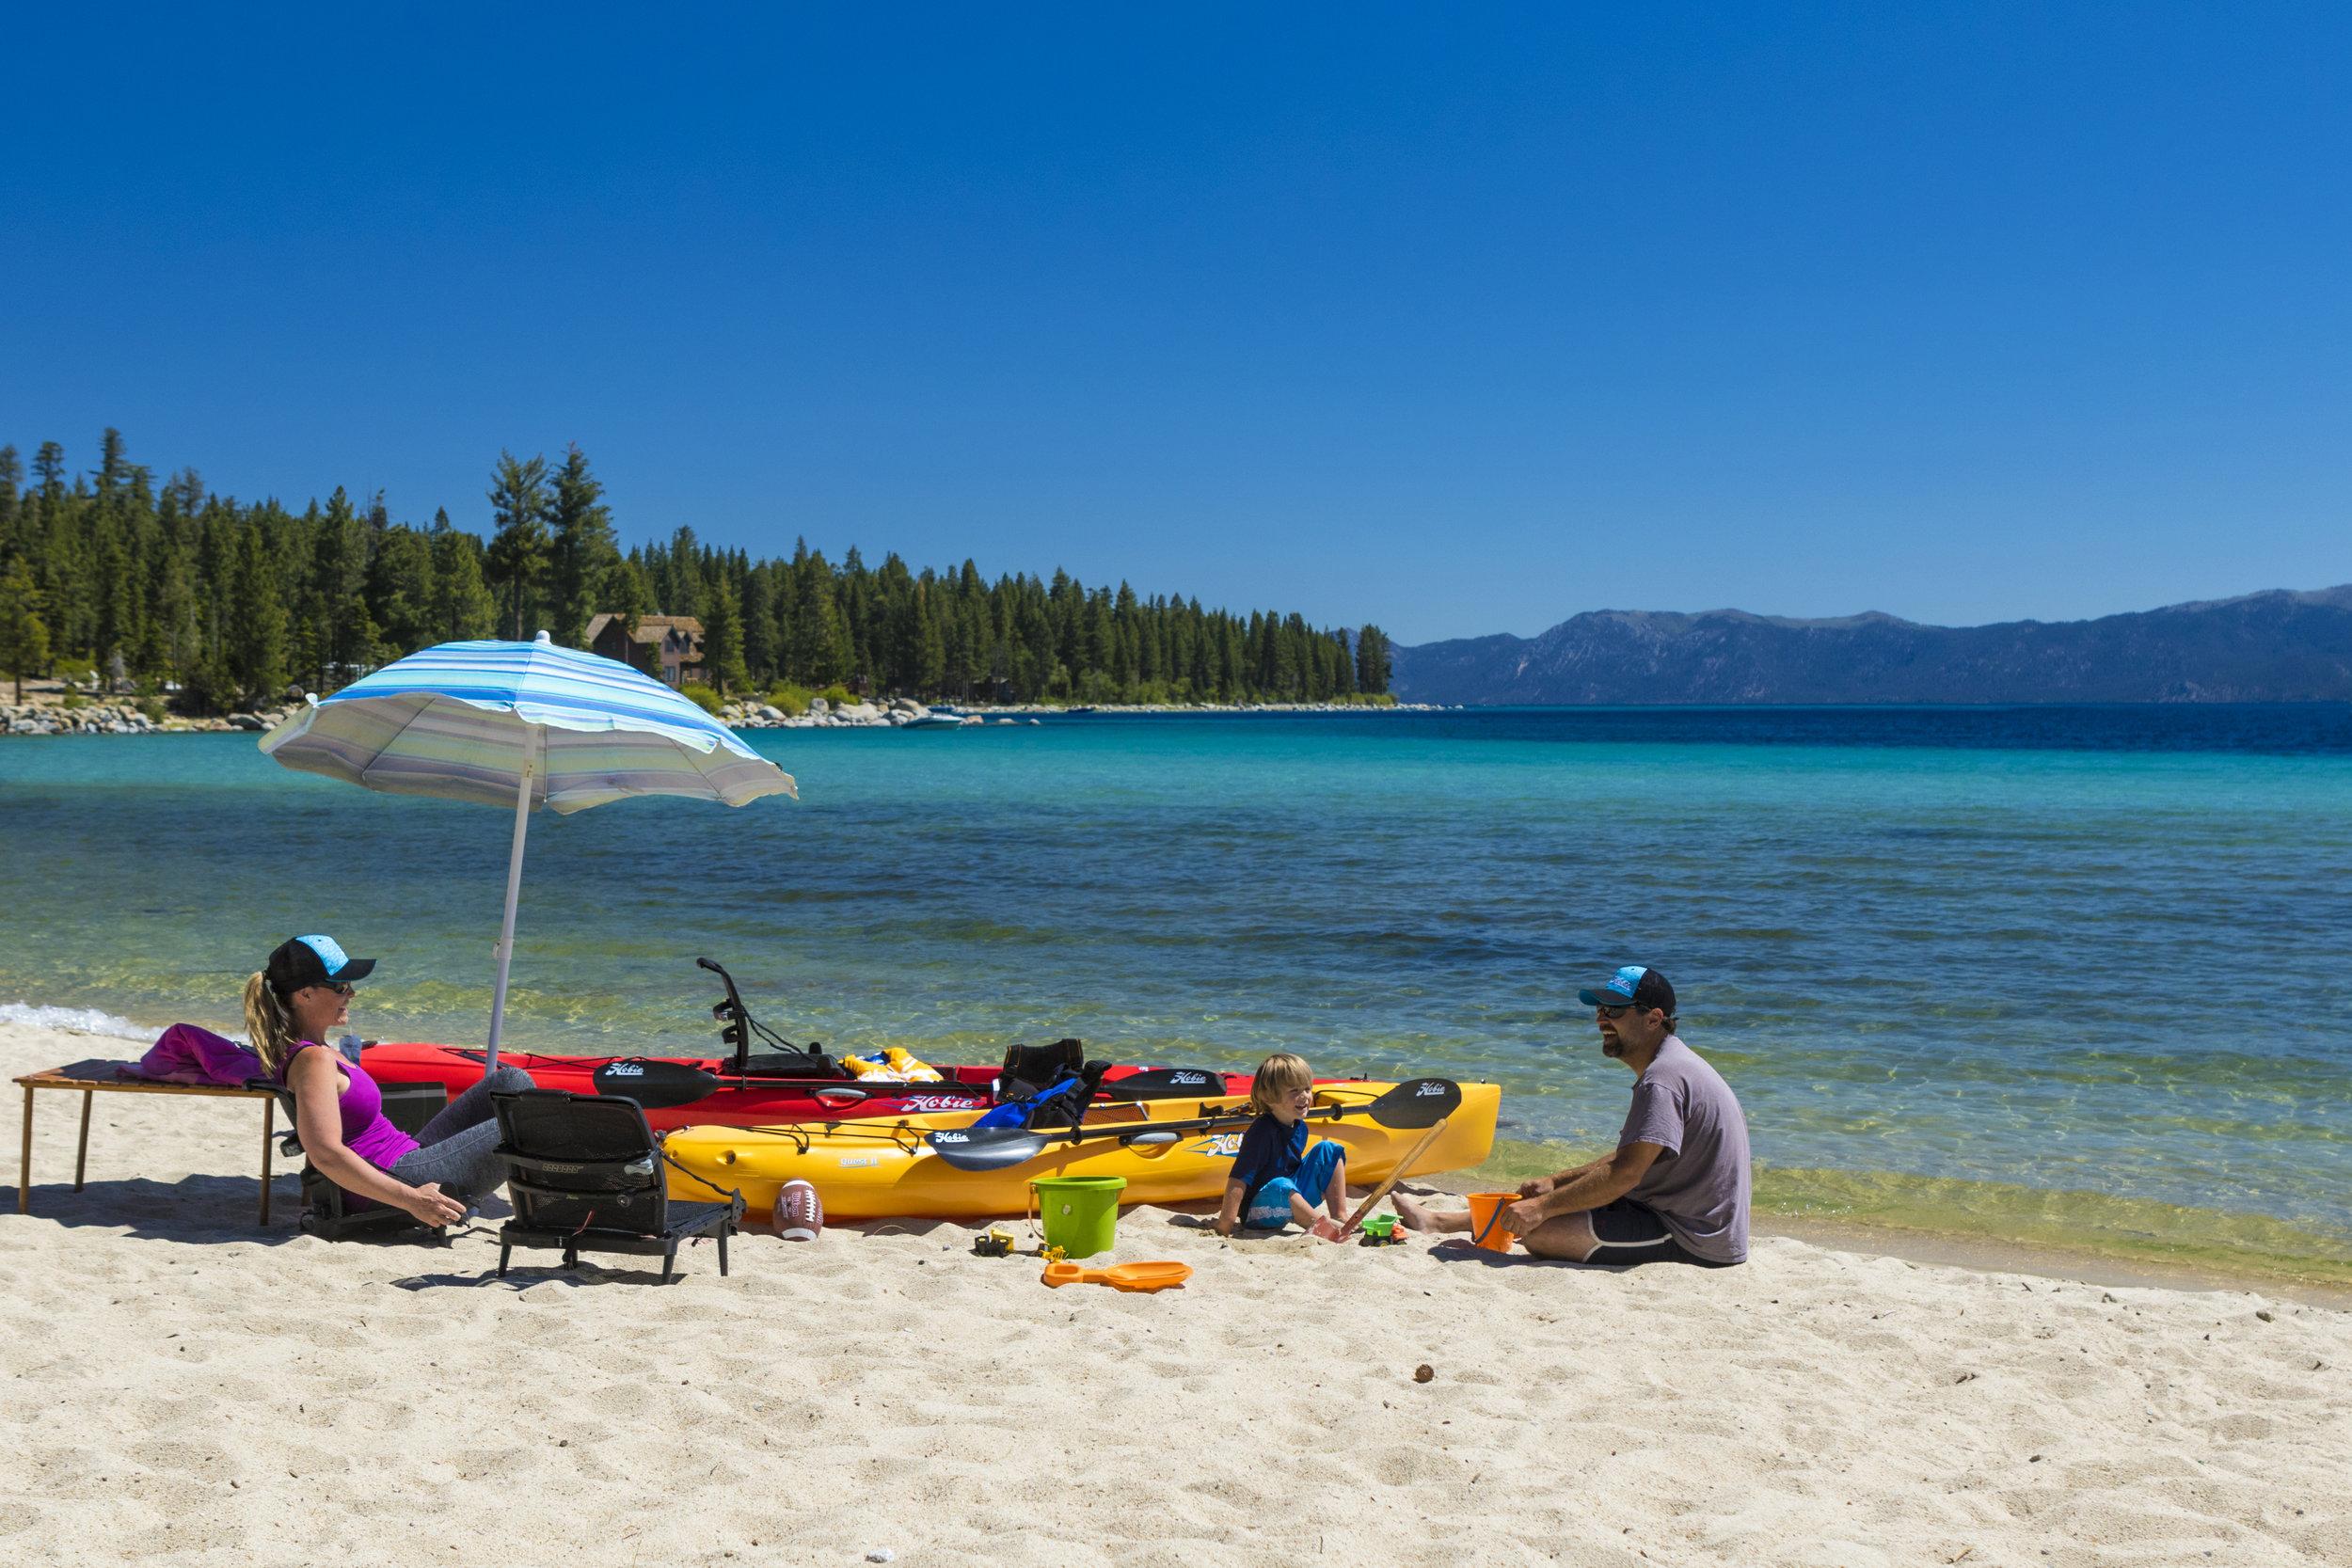 Quest_action_Tahoe_Family_beach_3360_full.jpg